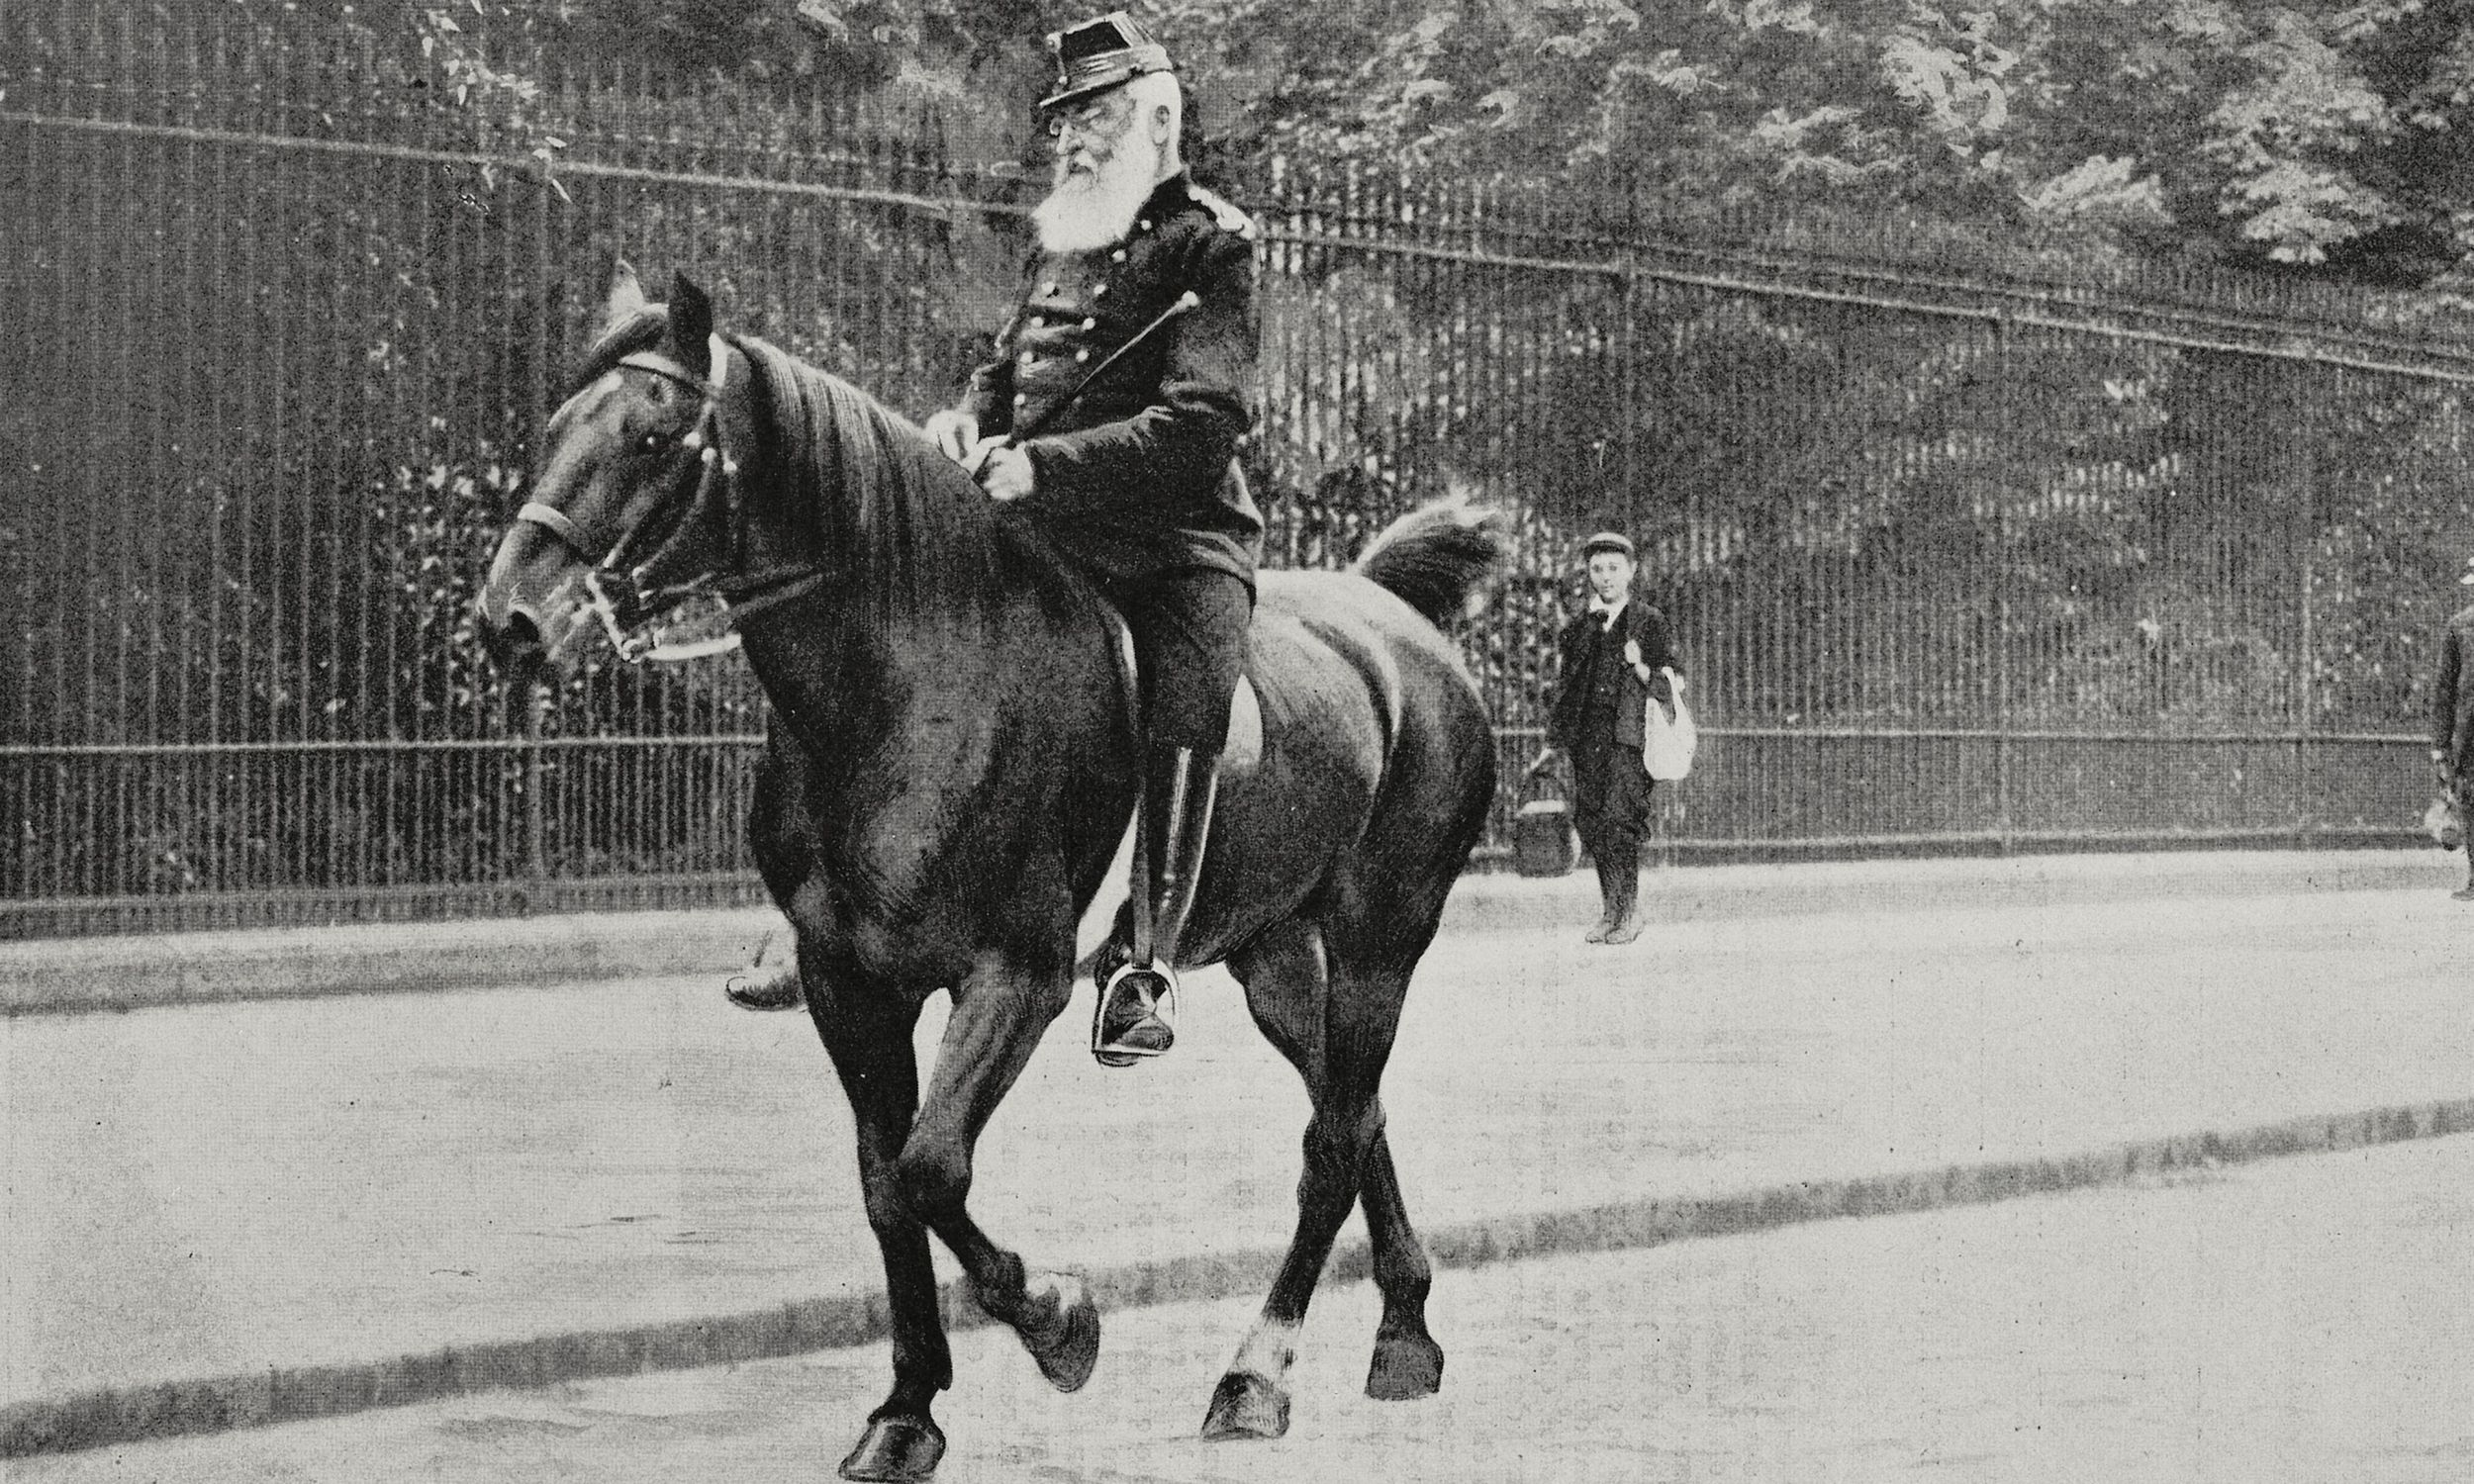 Król Leopold II na konnej przejażdżce w podbrukselskim Laeken Park w lipcu 1905 roku. Fot. Getty Images/De Agostini/Nadaud from L'Illustration, No 3256, July 22, 1905.